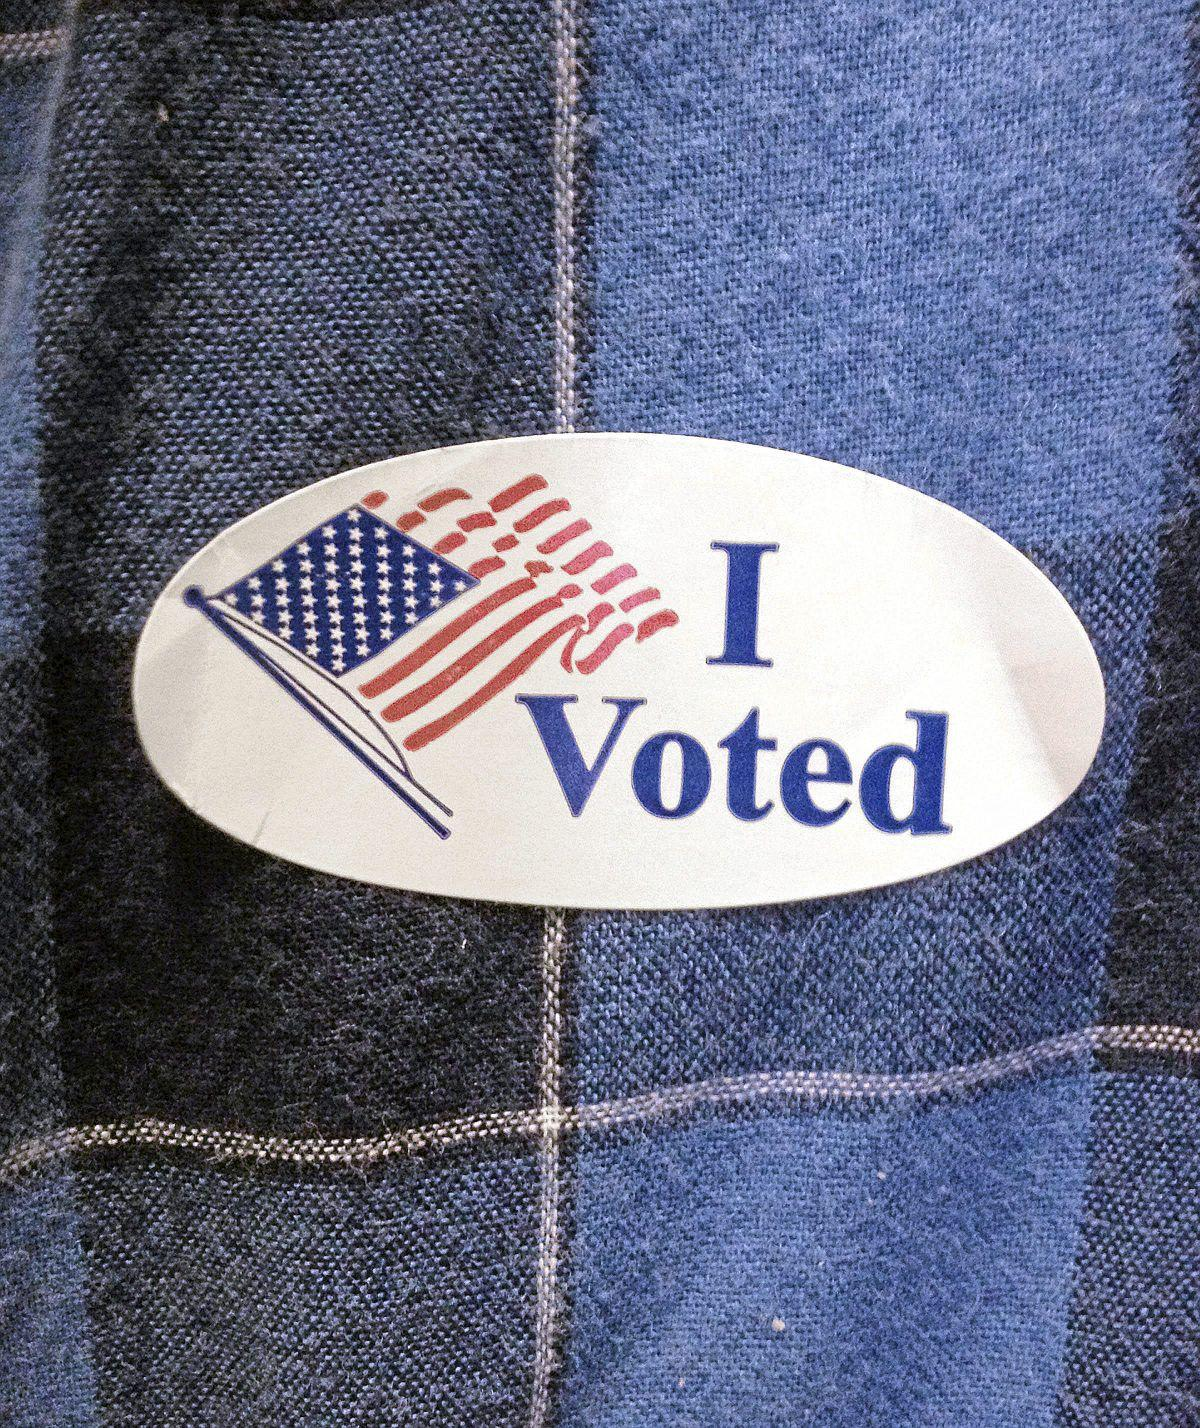 I voted sticker (copy)